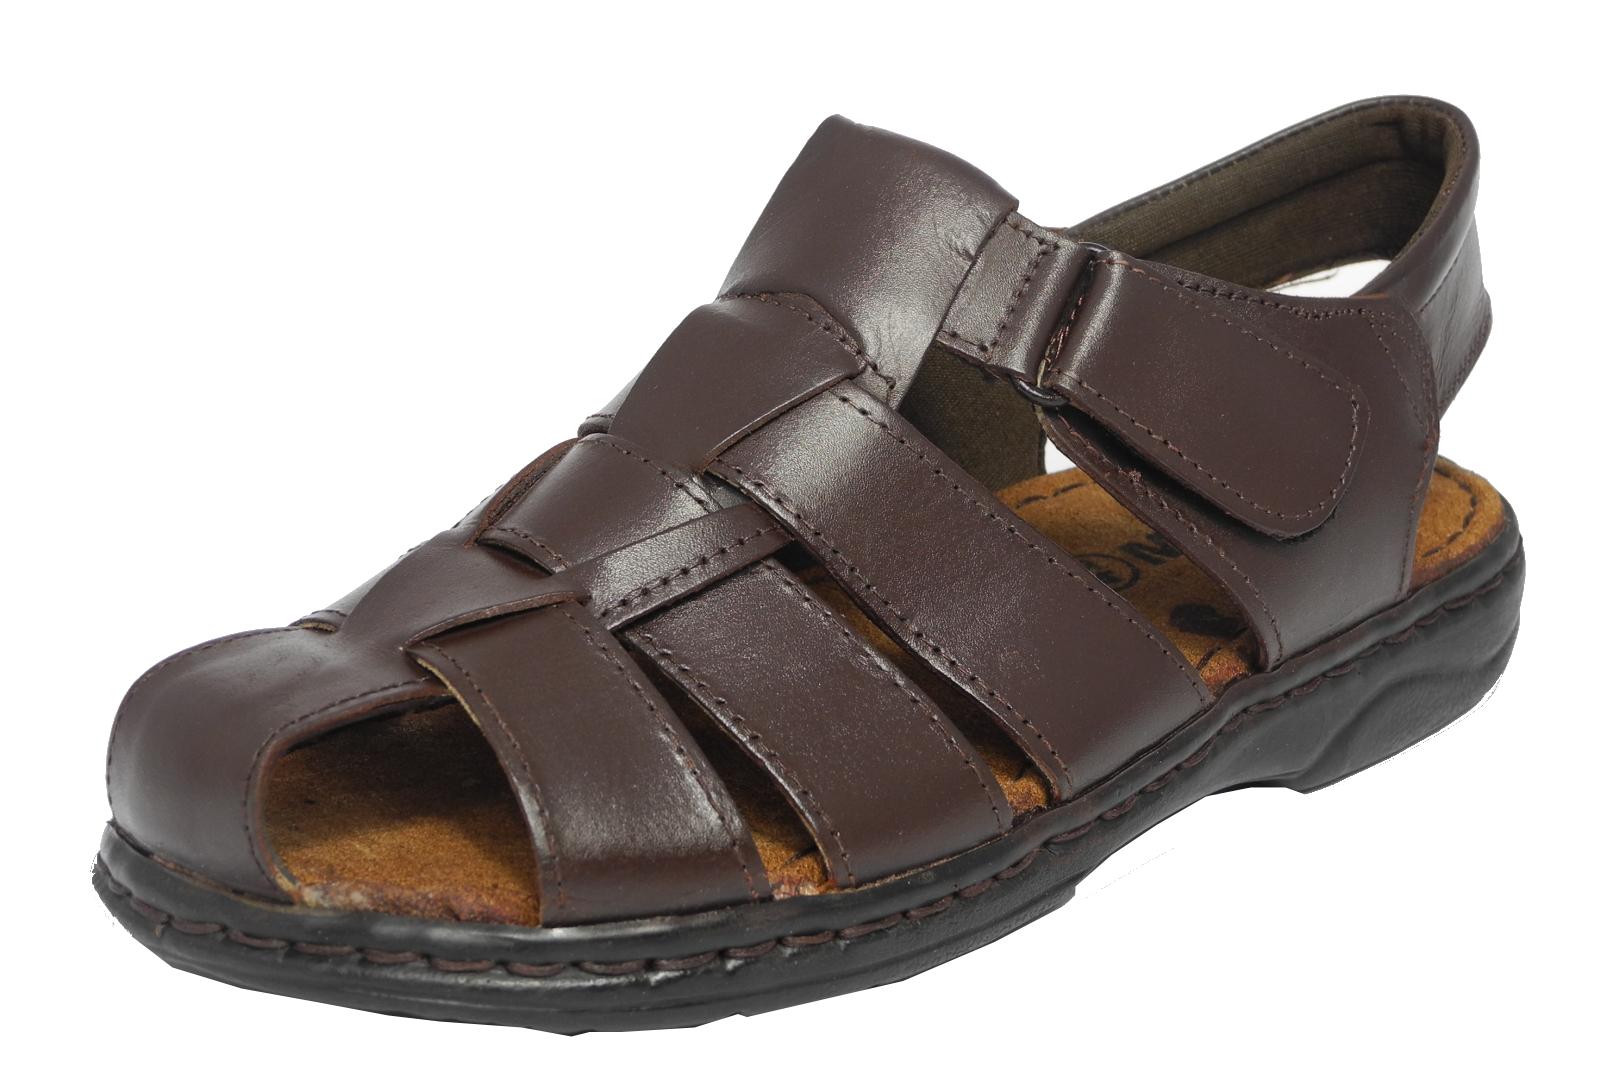 Clarks Mens Hiking Shoe